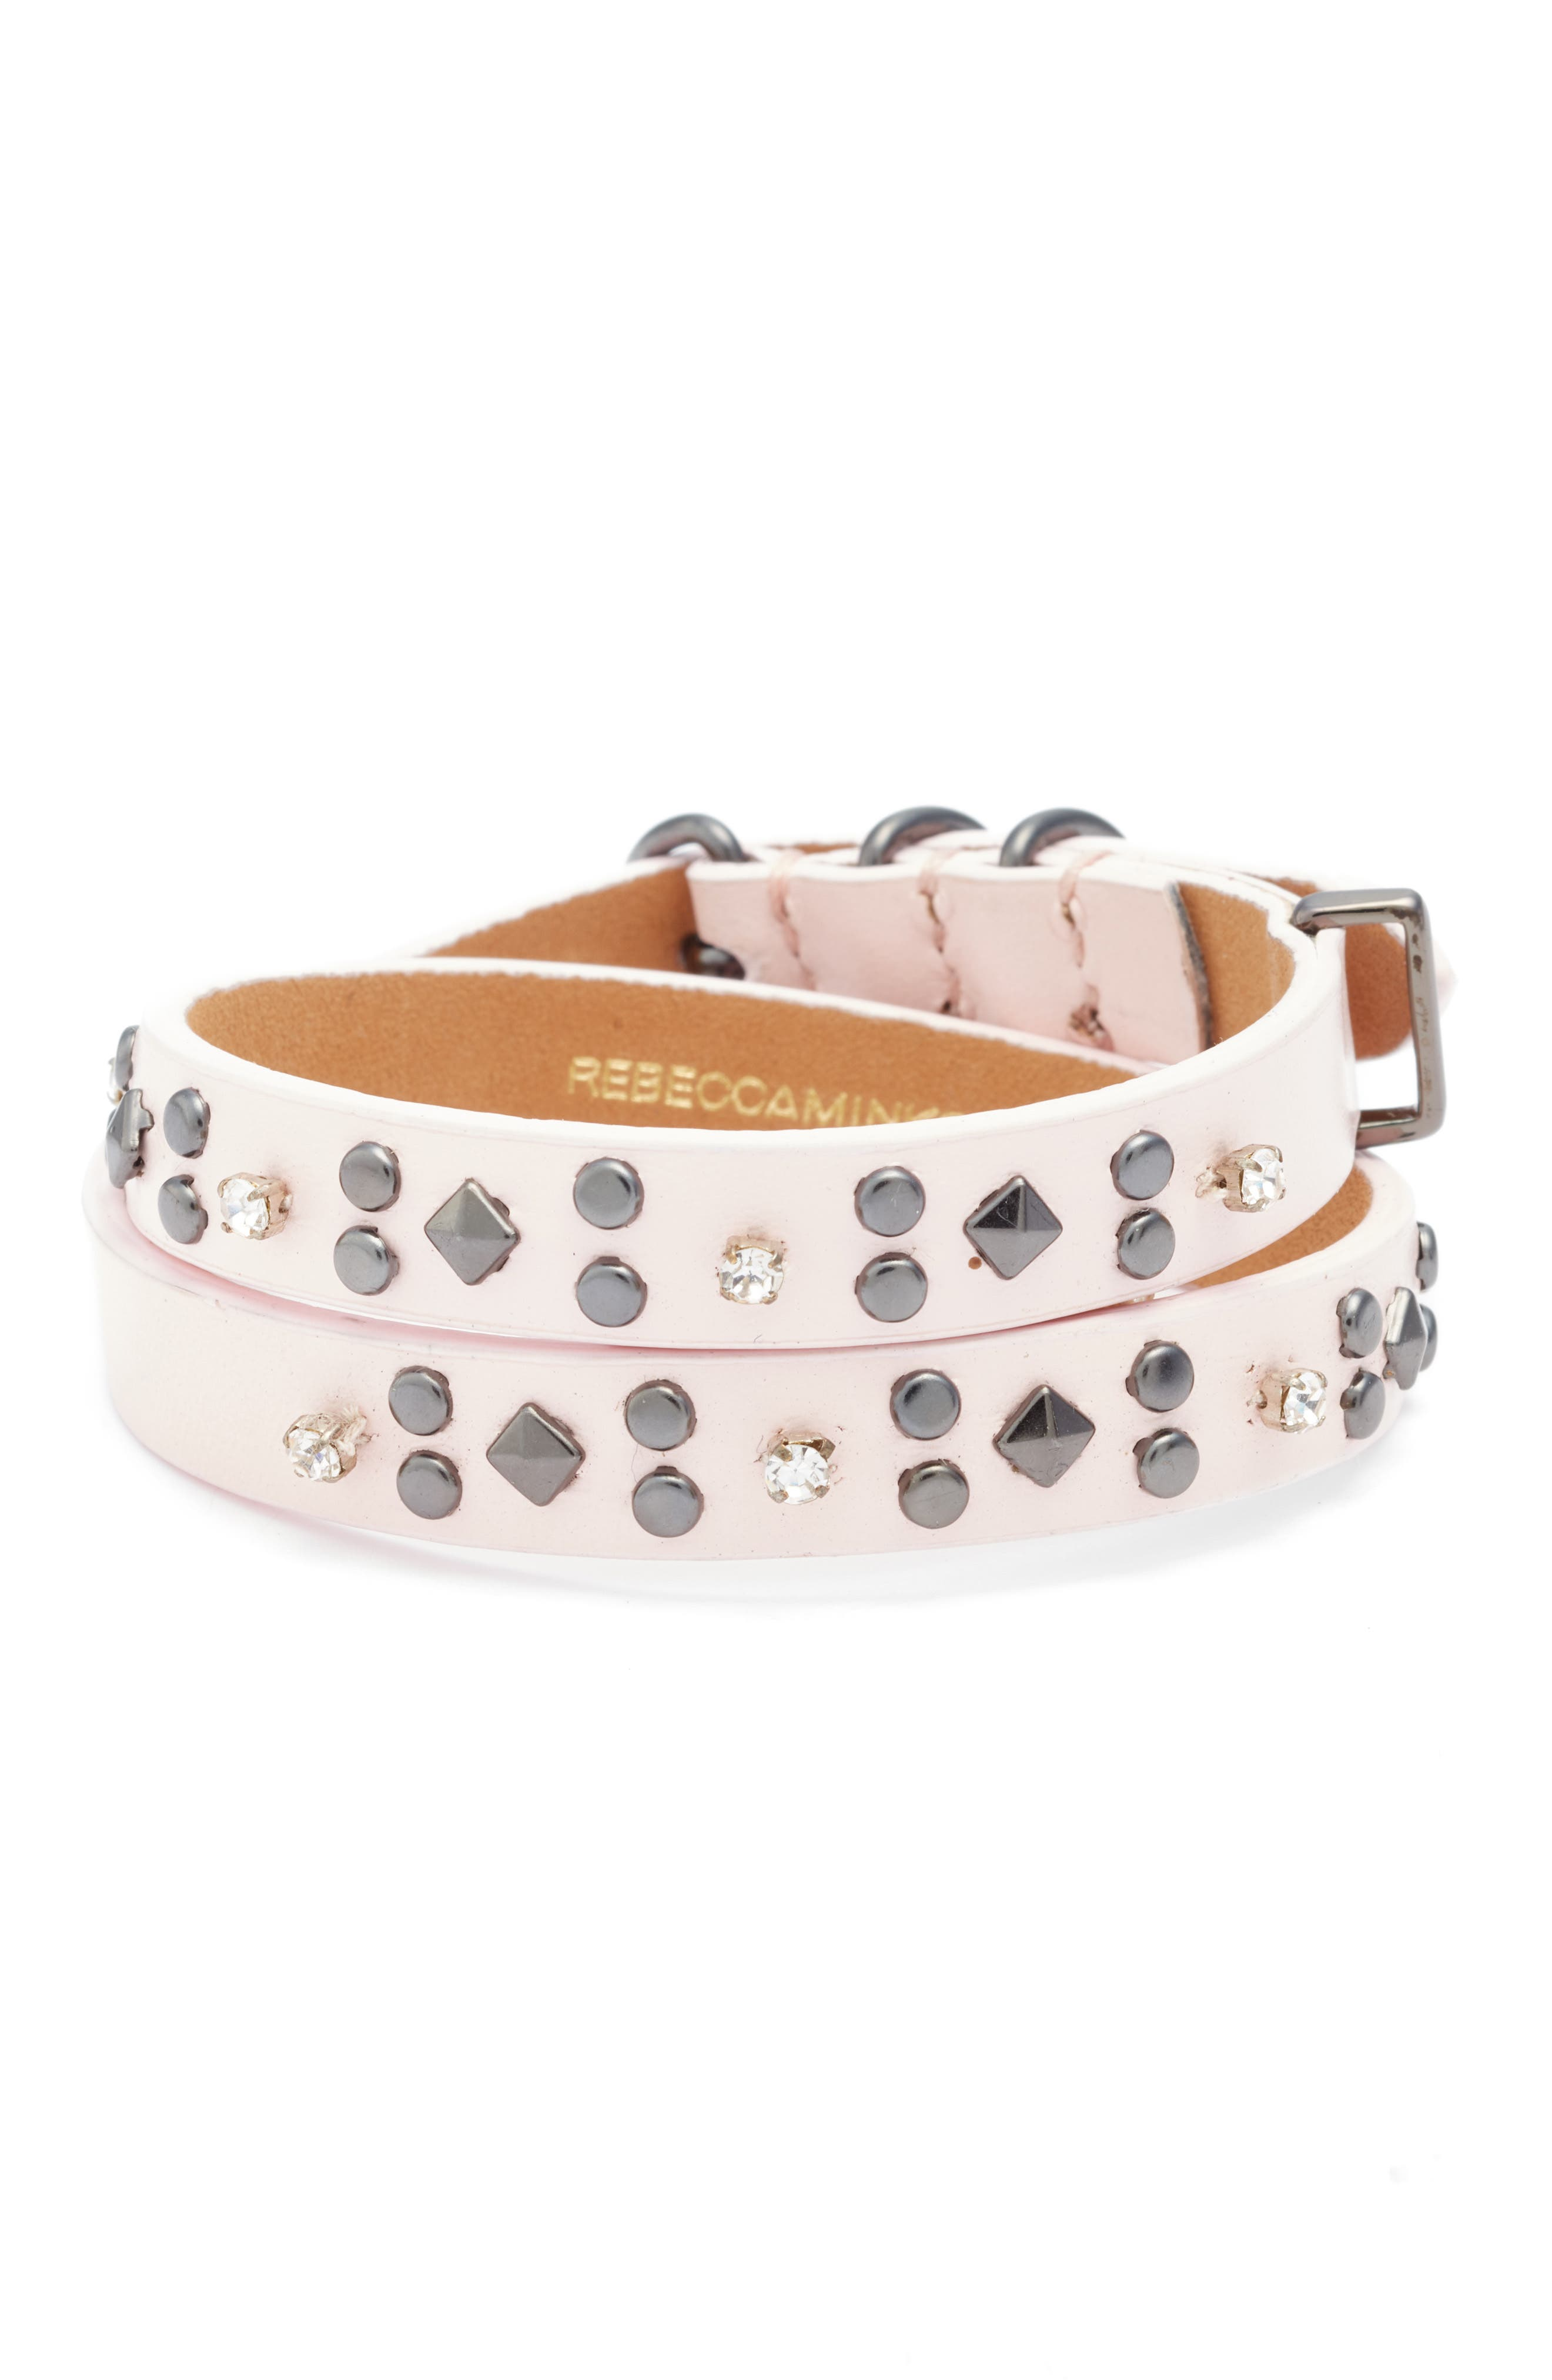 Rebecca Minkoff Wrap Leather Bracelet